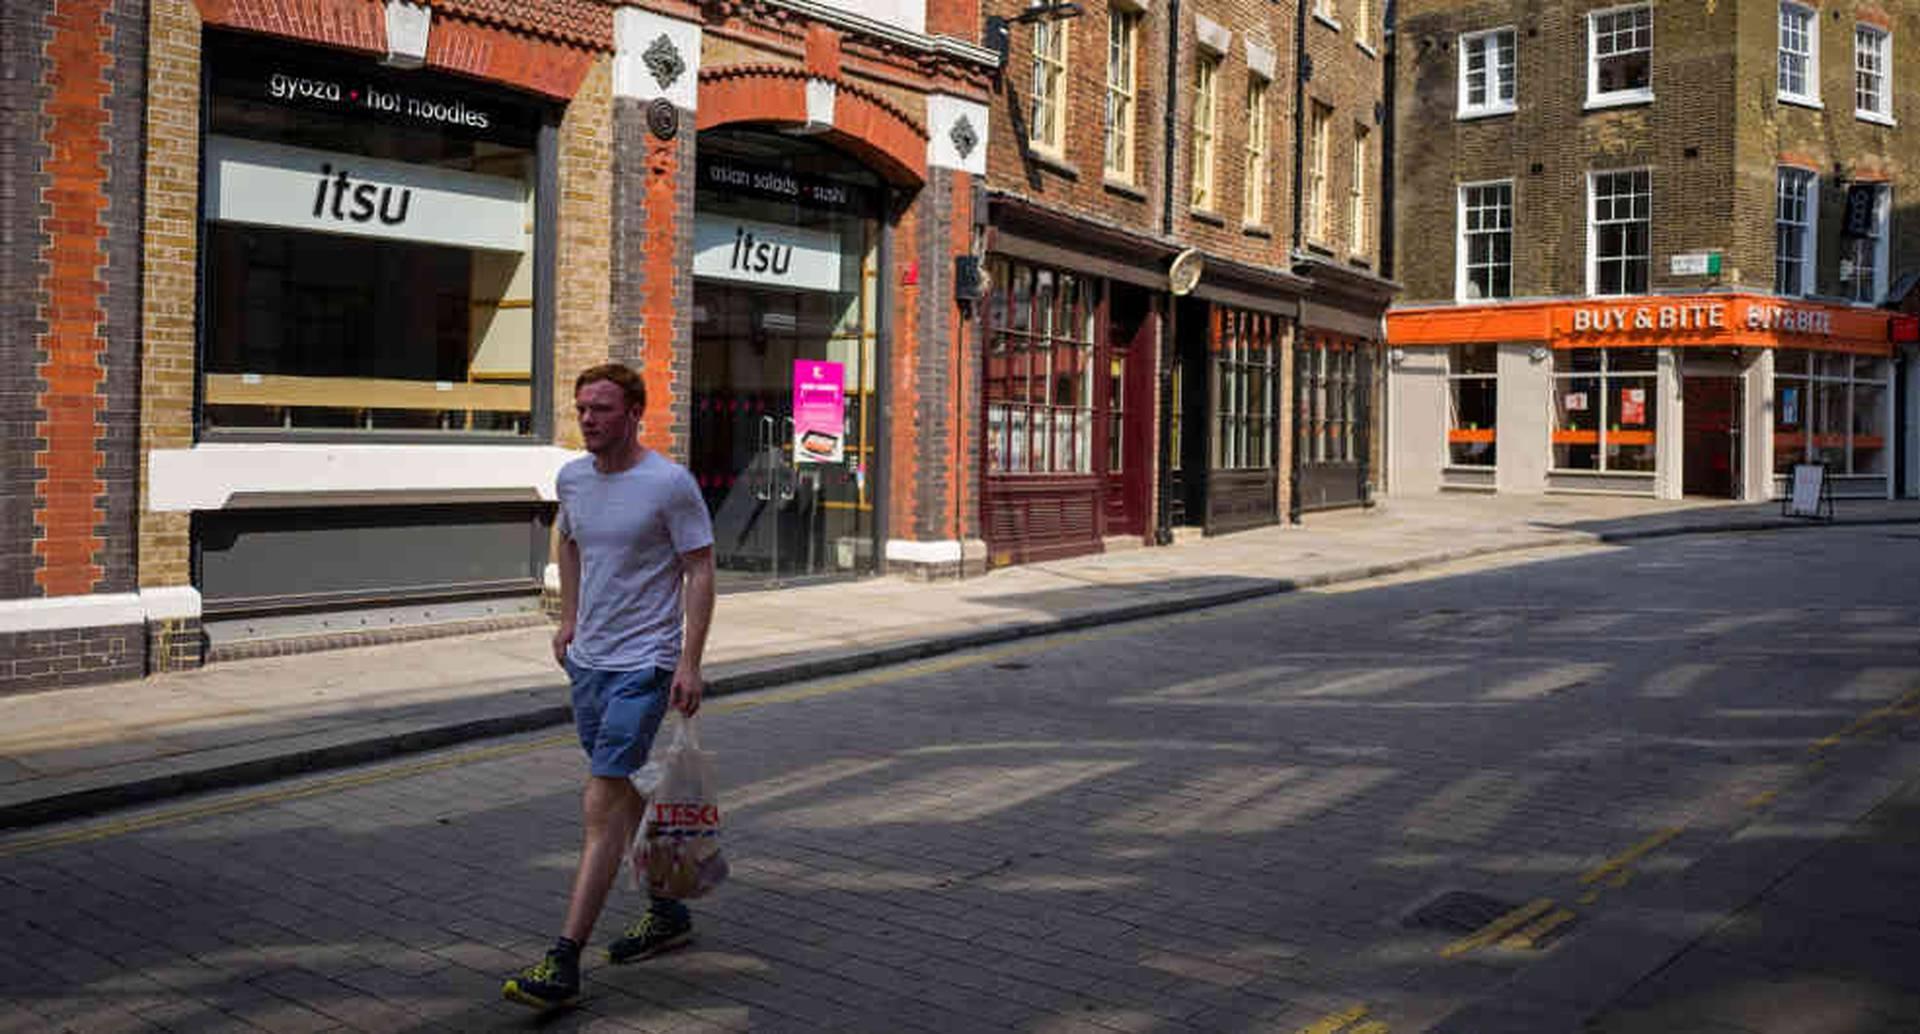 Reino Unido, ante nuevo rebrote de coronavirus